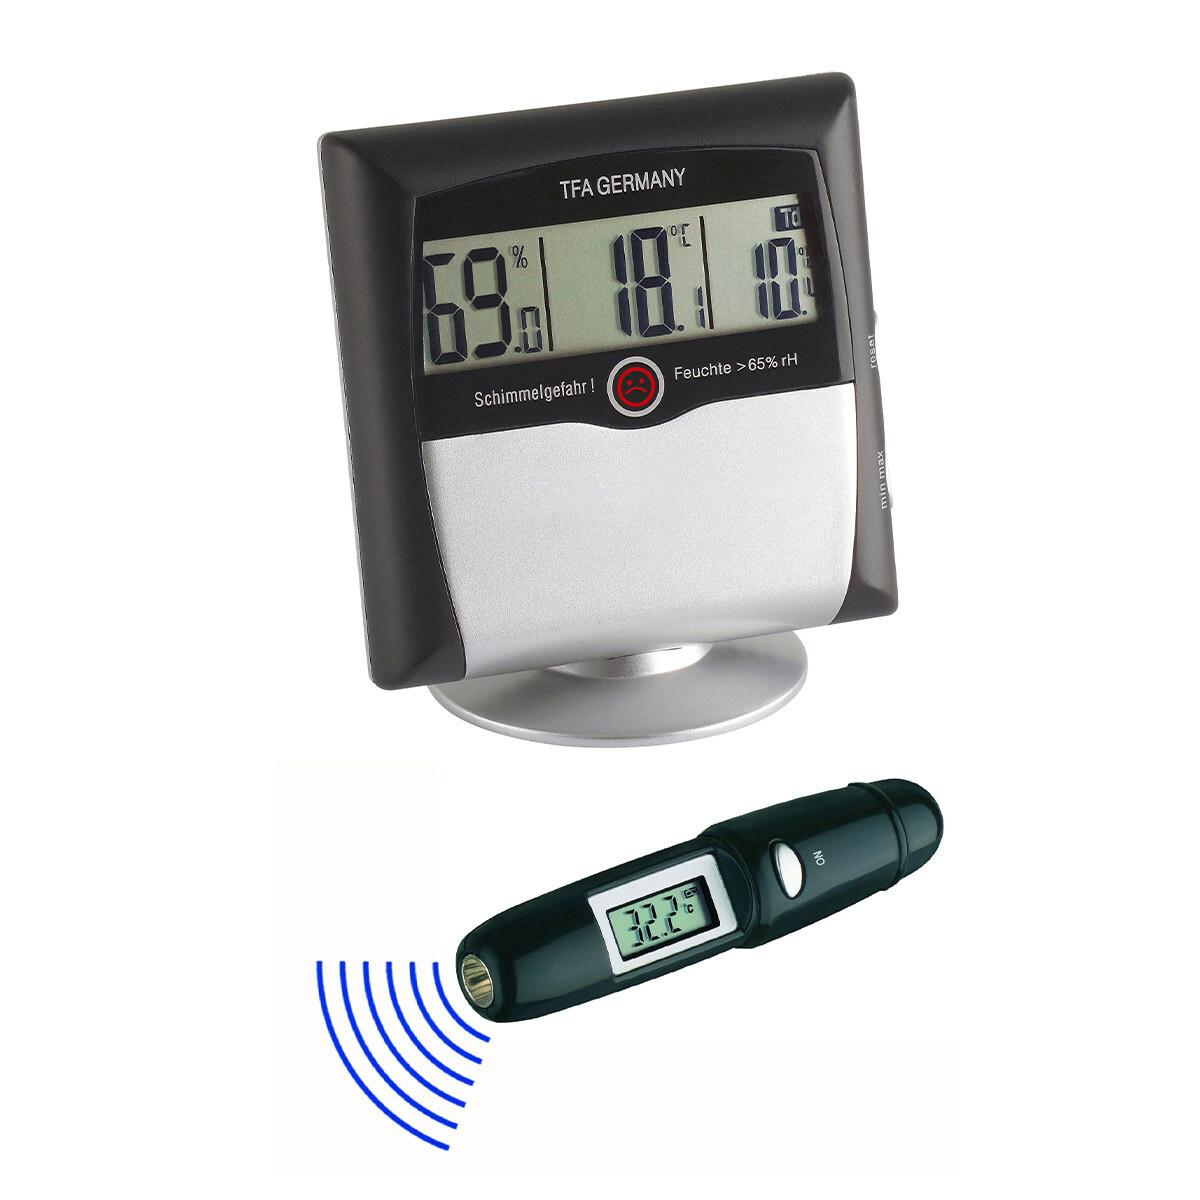 Digitales Thermo-Hygrometer und Infrarotthermometer KLIMA CONTROL SET